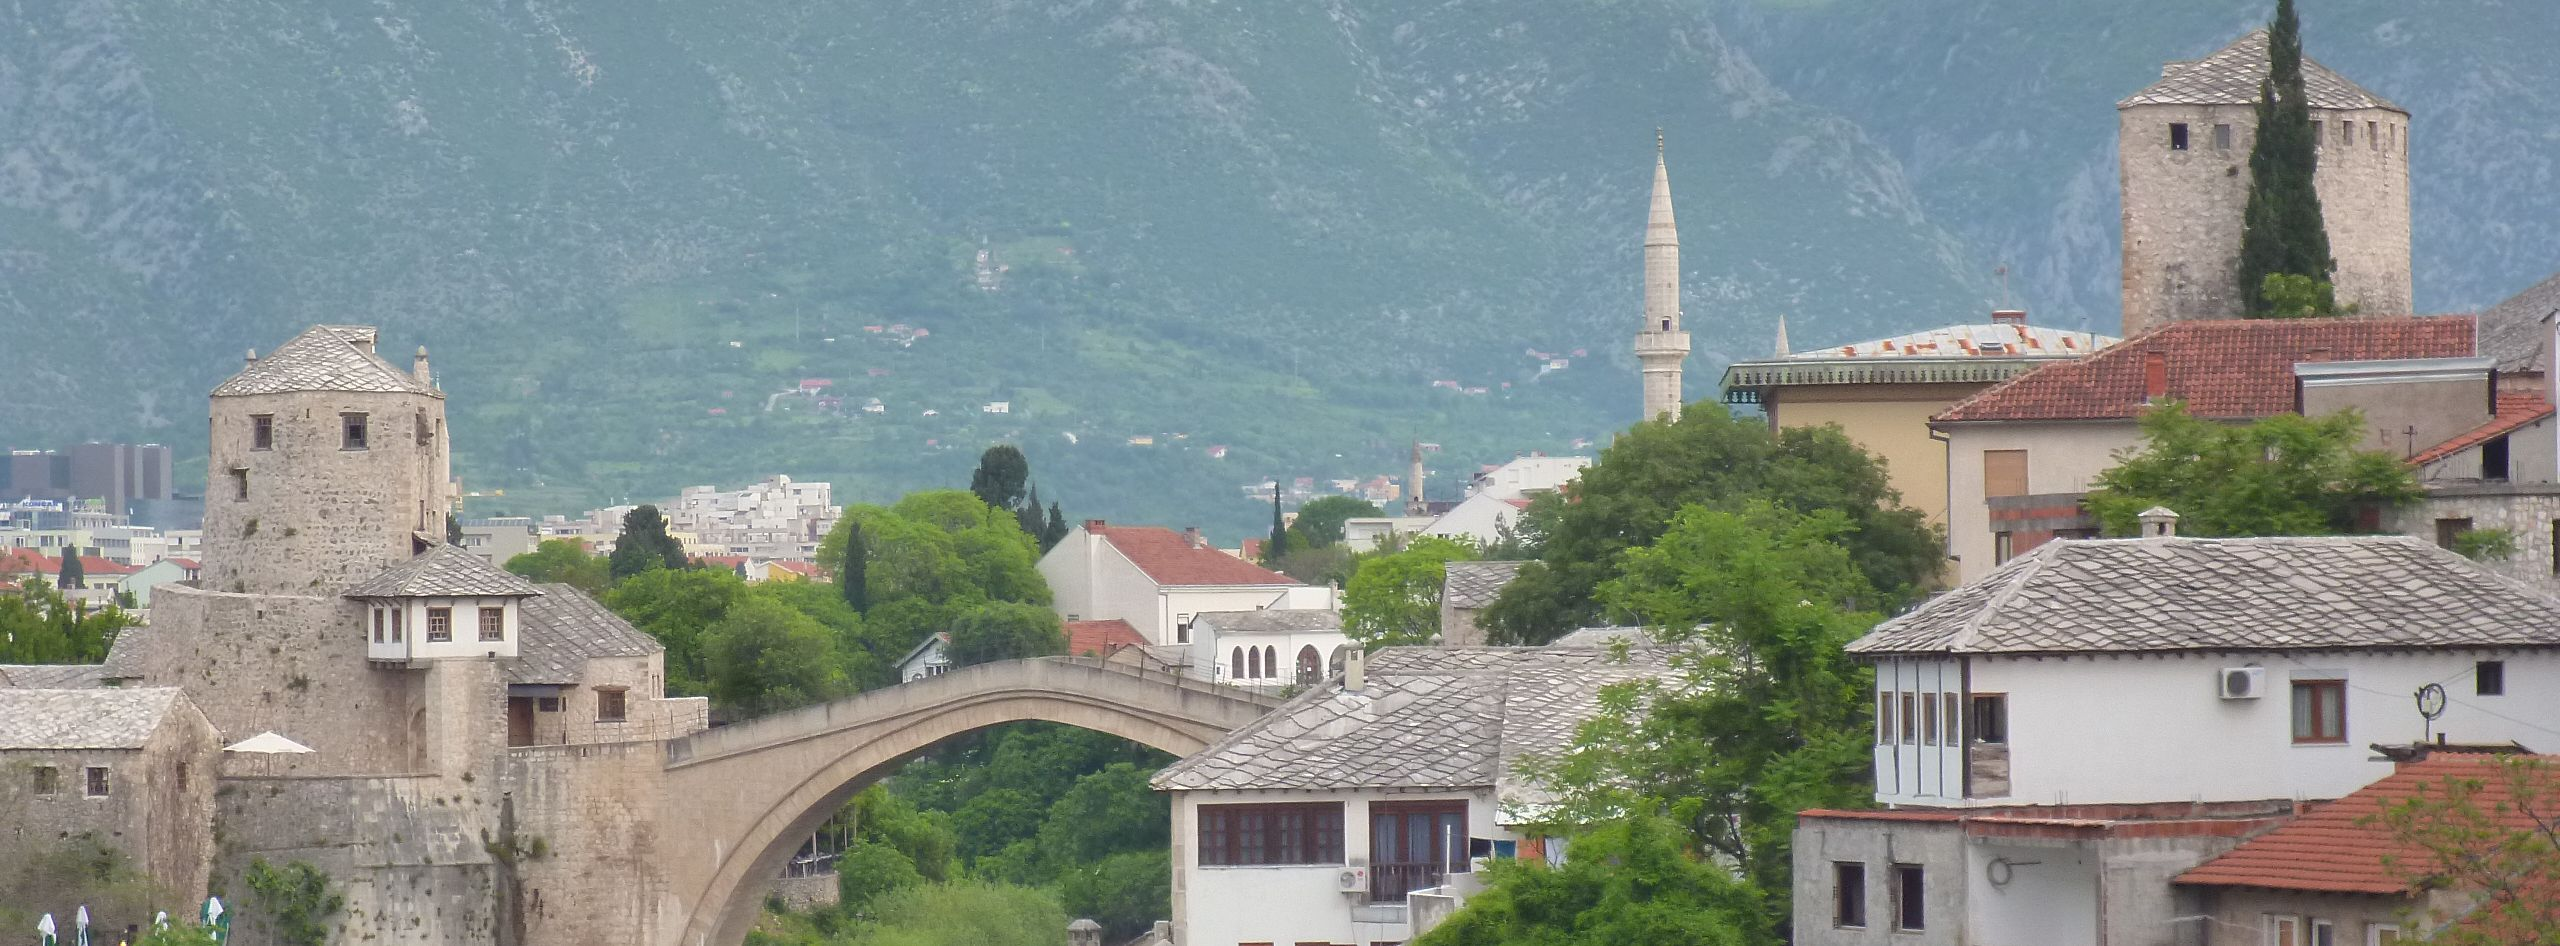 Башни Тара и Халебия. Фото: Елена Арсениевич, CC BY-SA 3.0